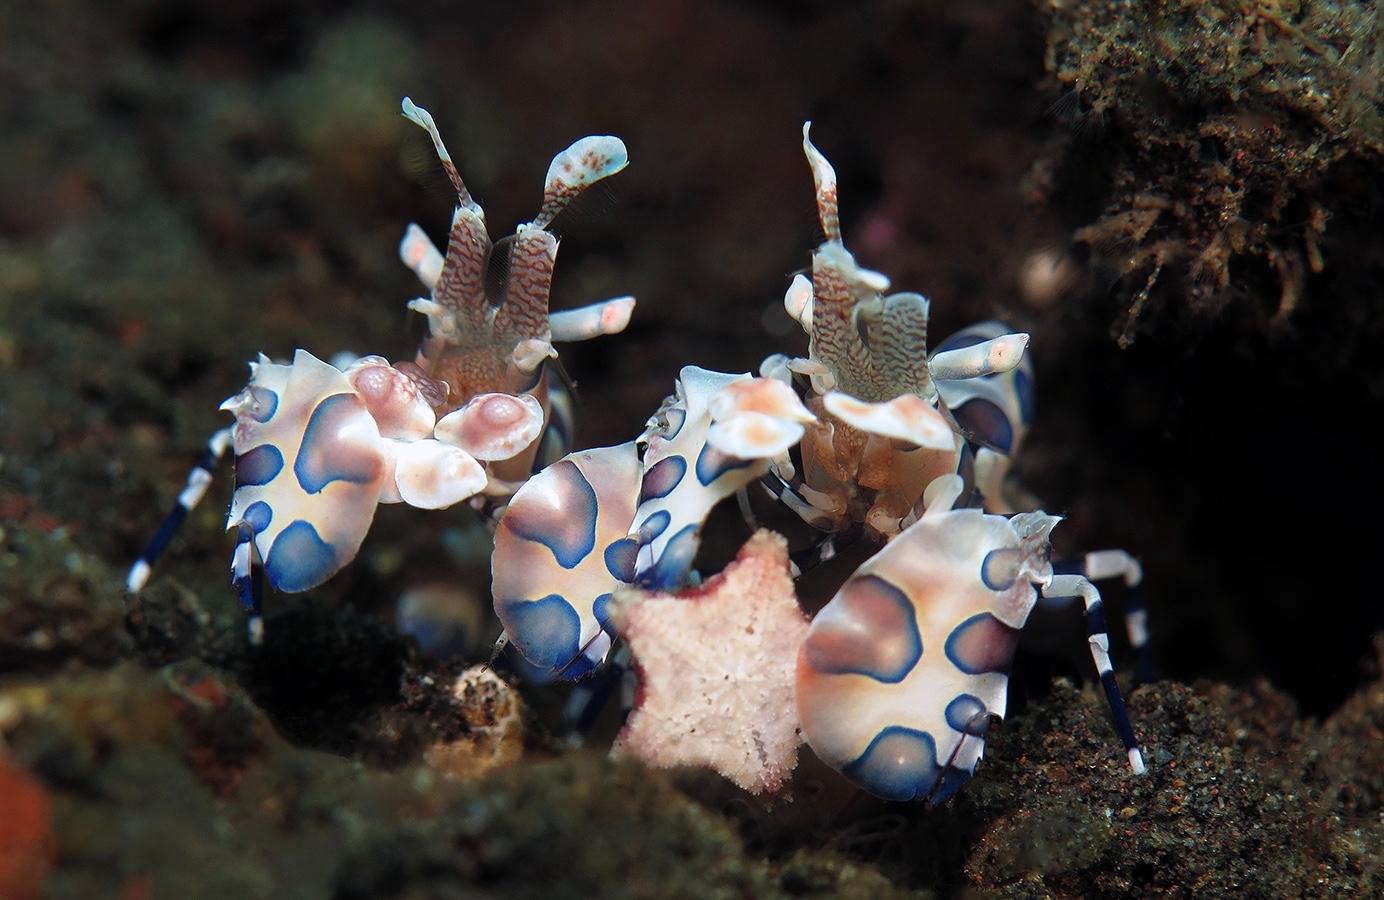 Hymenocera picta    , 巴厘岛图蓝本 Tulamben 印度尼西亚 Indonesia @lazydiving.com 潜水时光